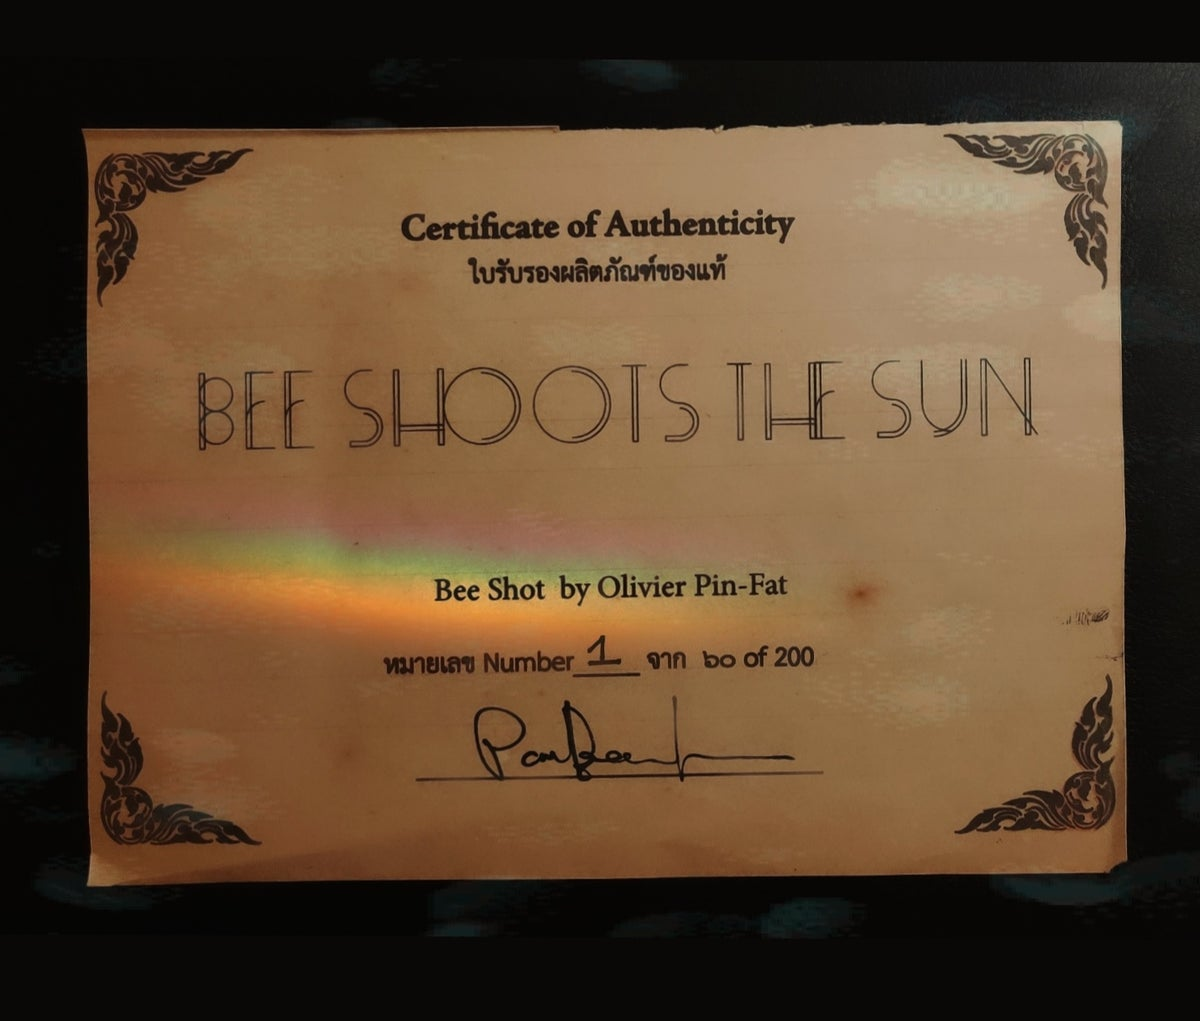 Bee Shoots the Sun